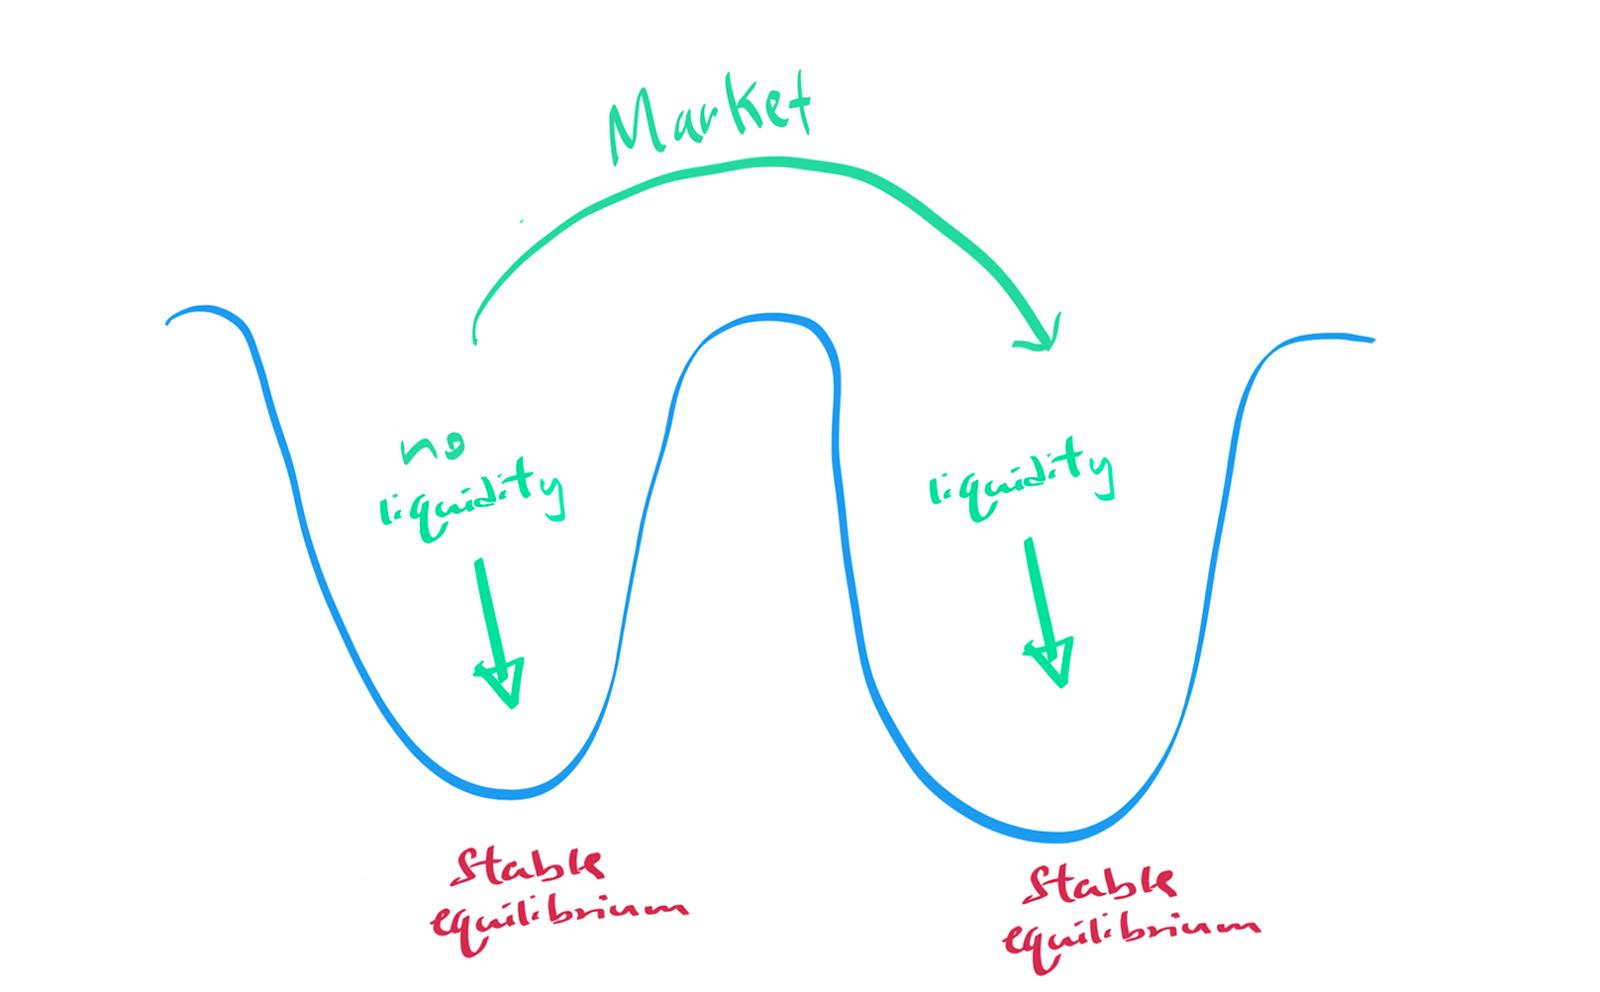 Work @ Carta, get liquidity 1